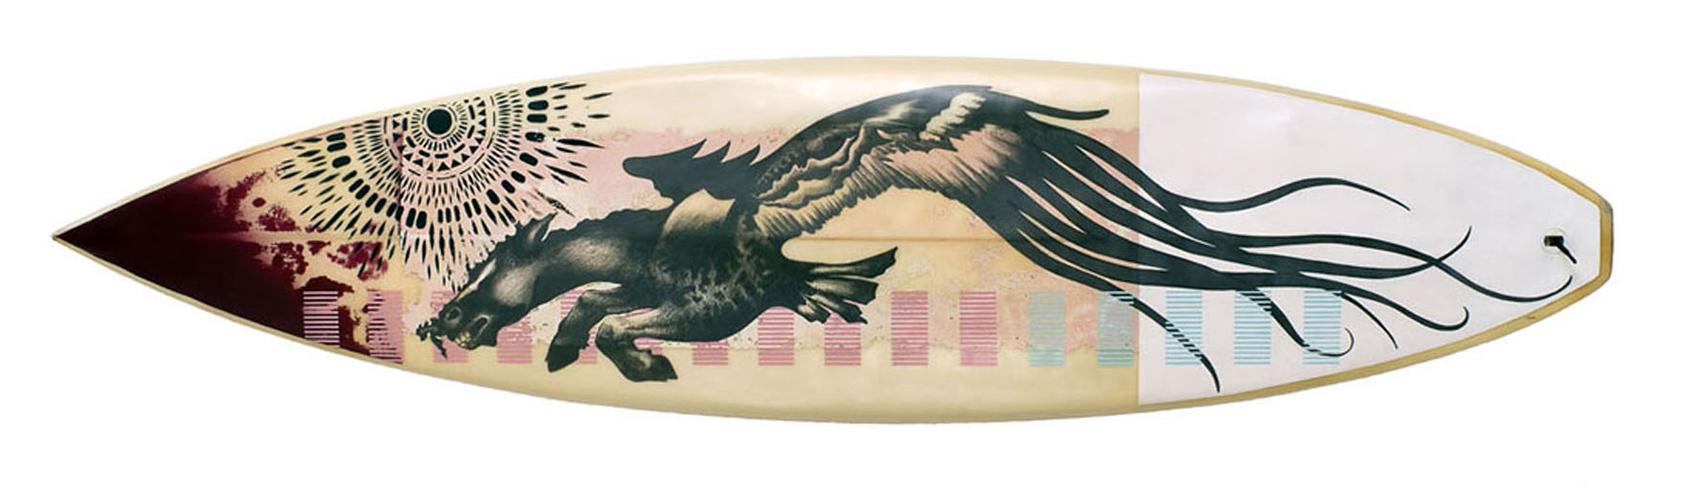 pegasus surfboard by khanage